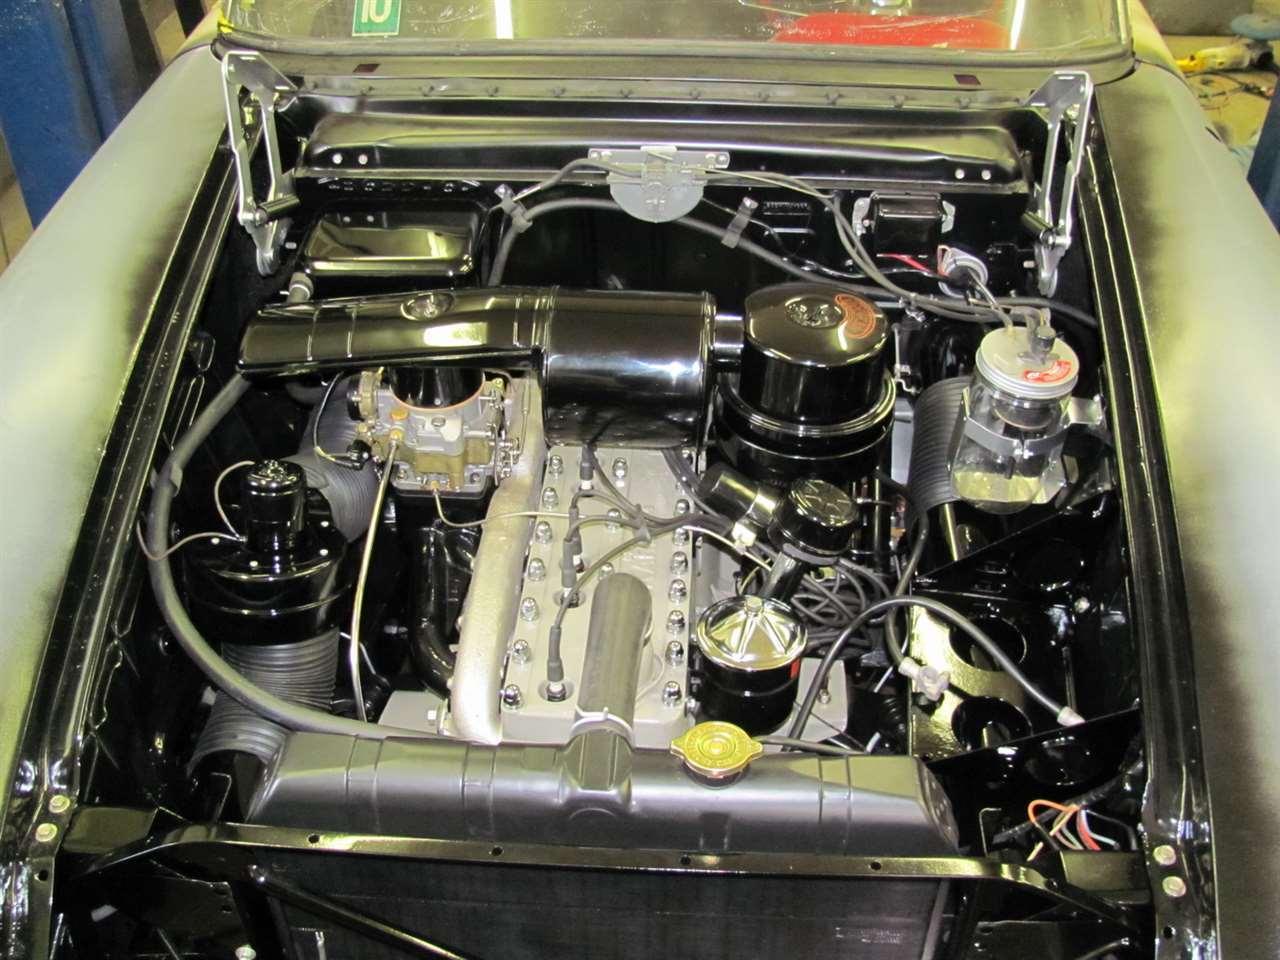 Balboa engine compartment